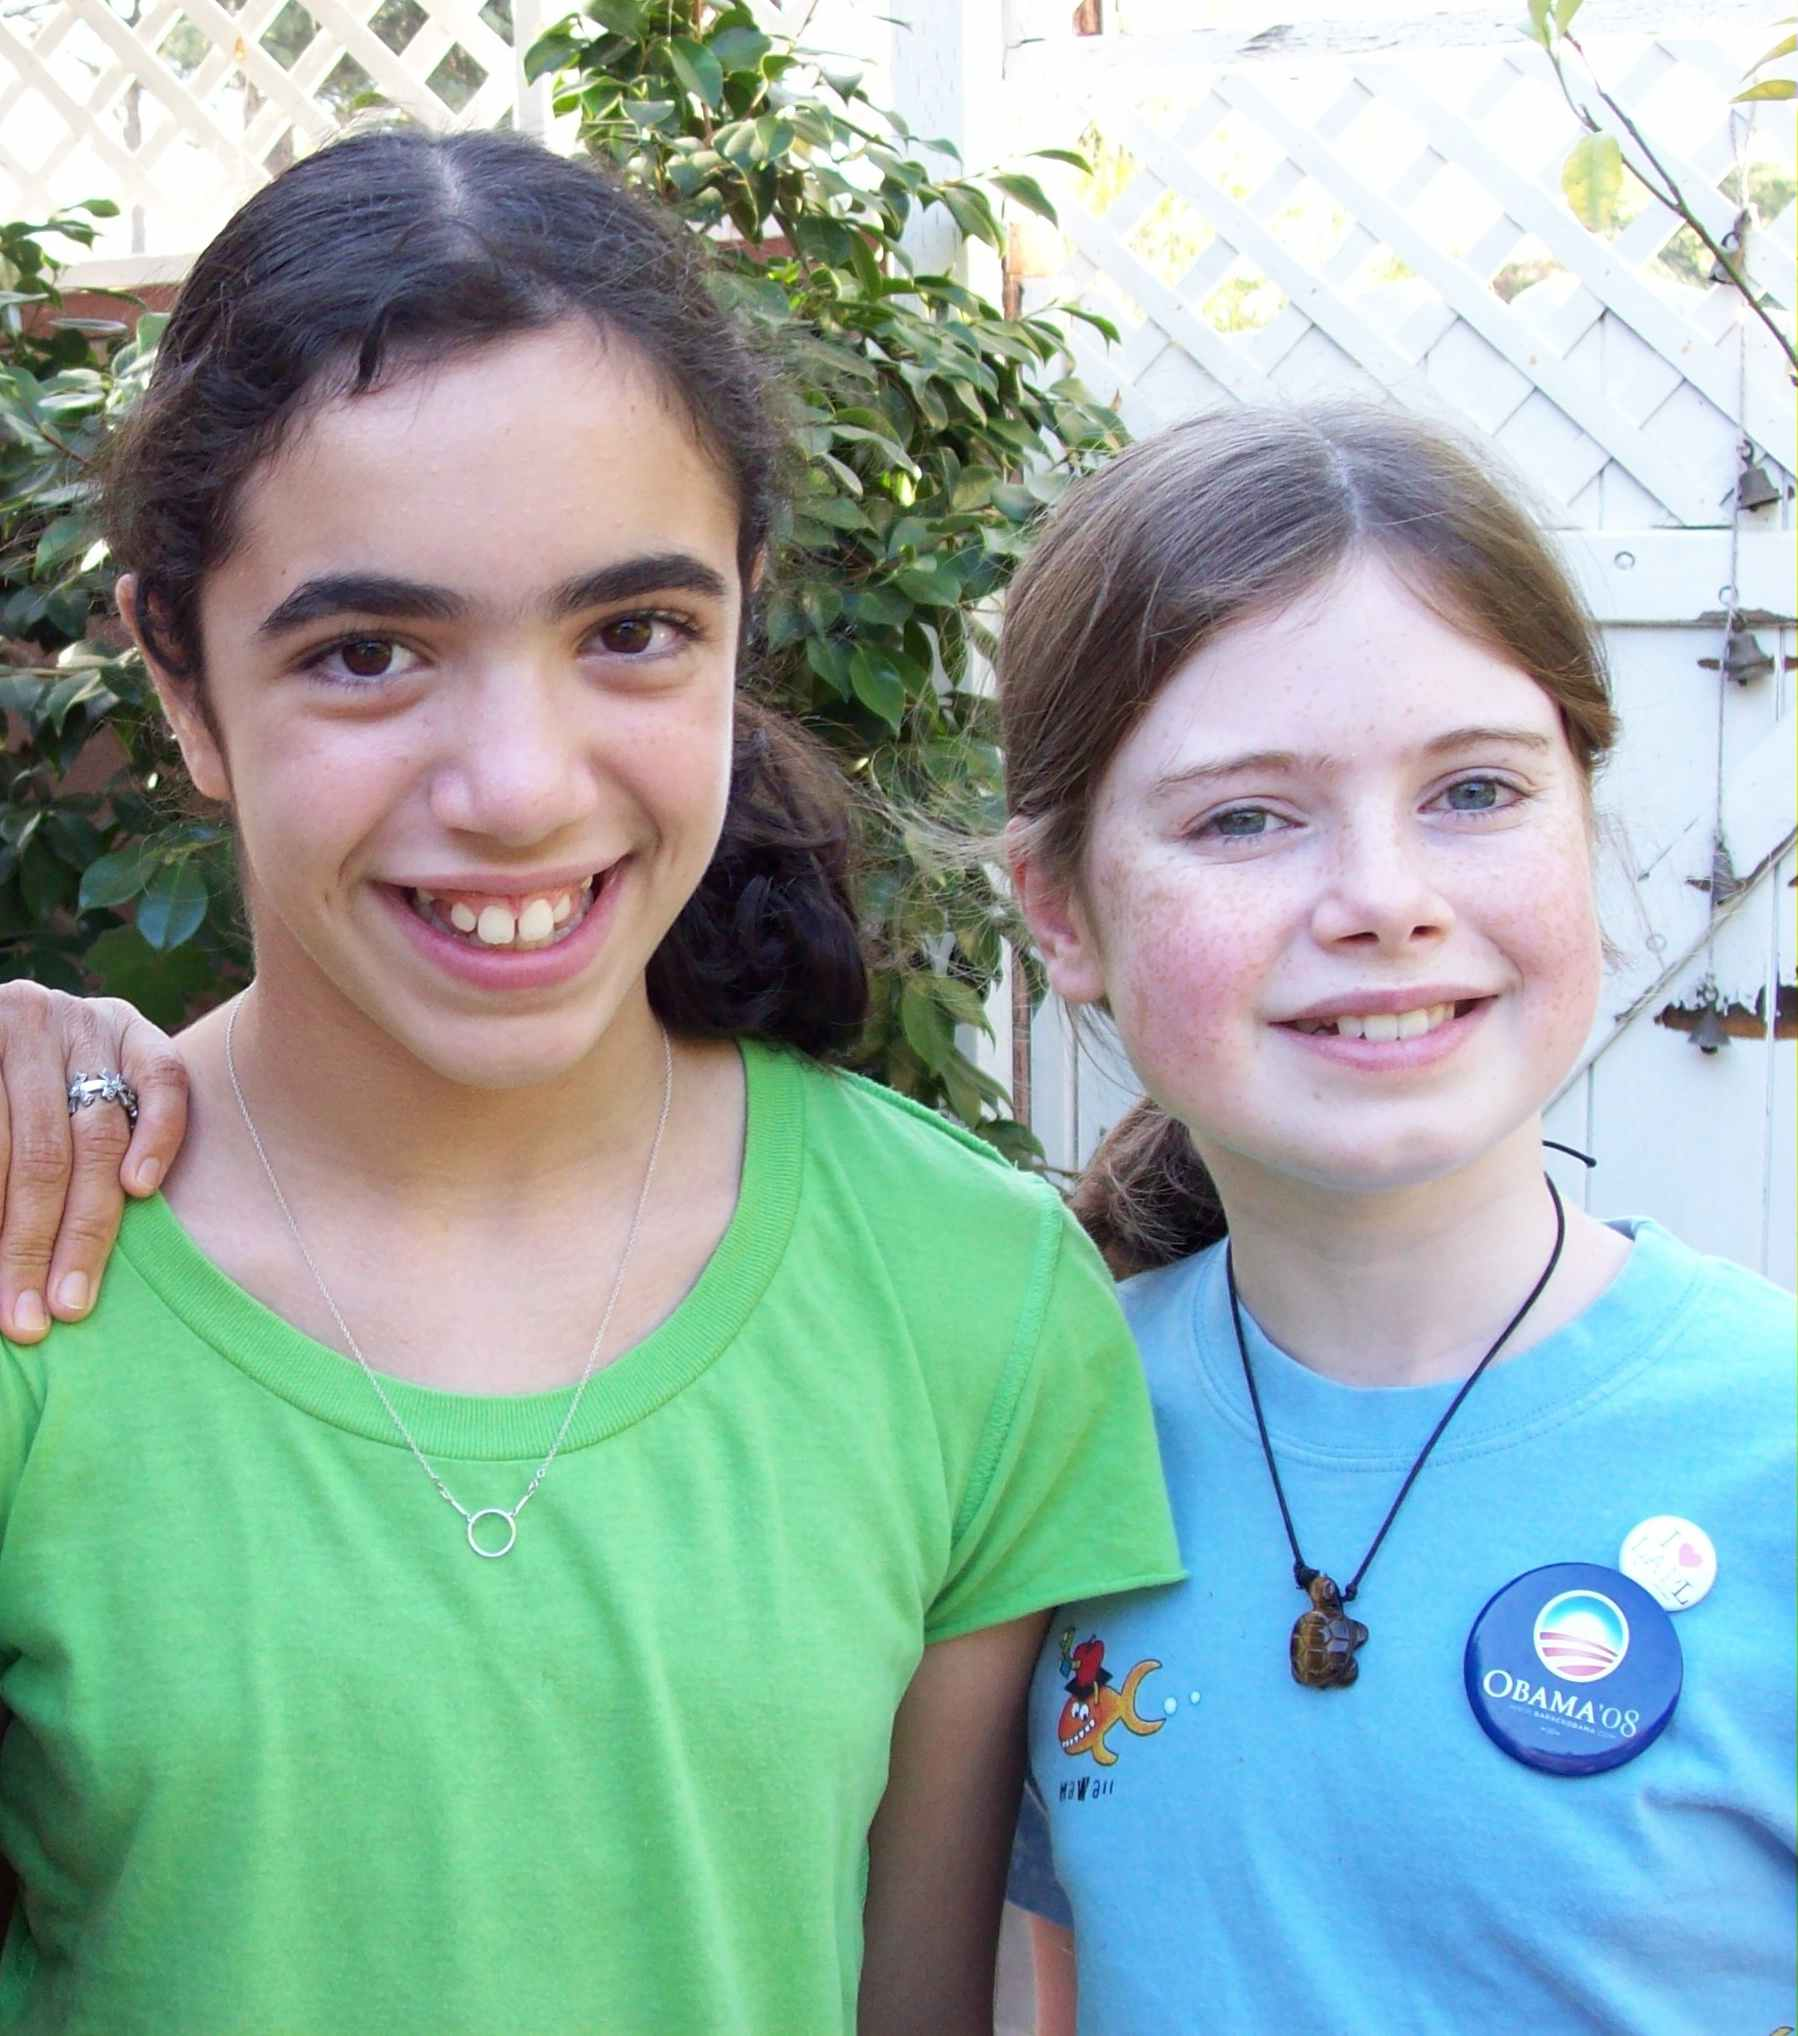 A Friend Interviews Natalie About Home School